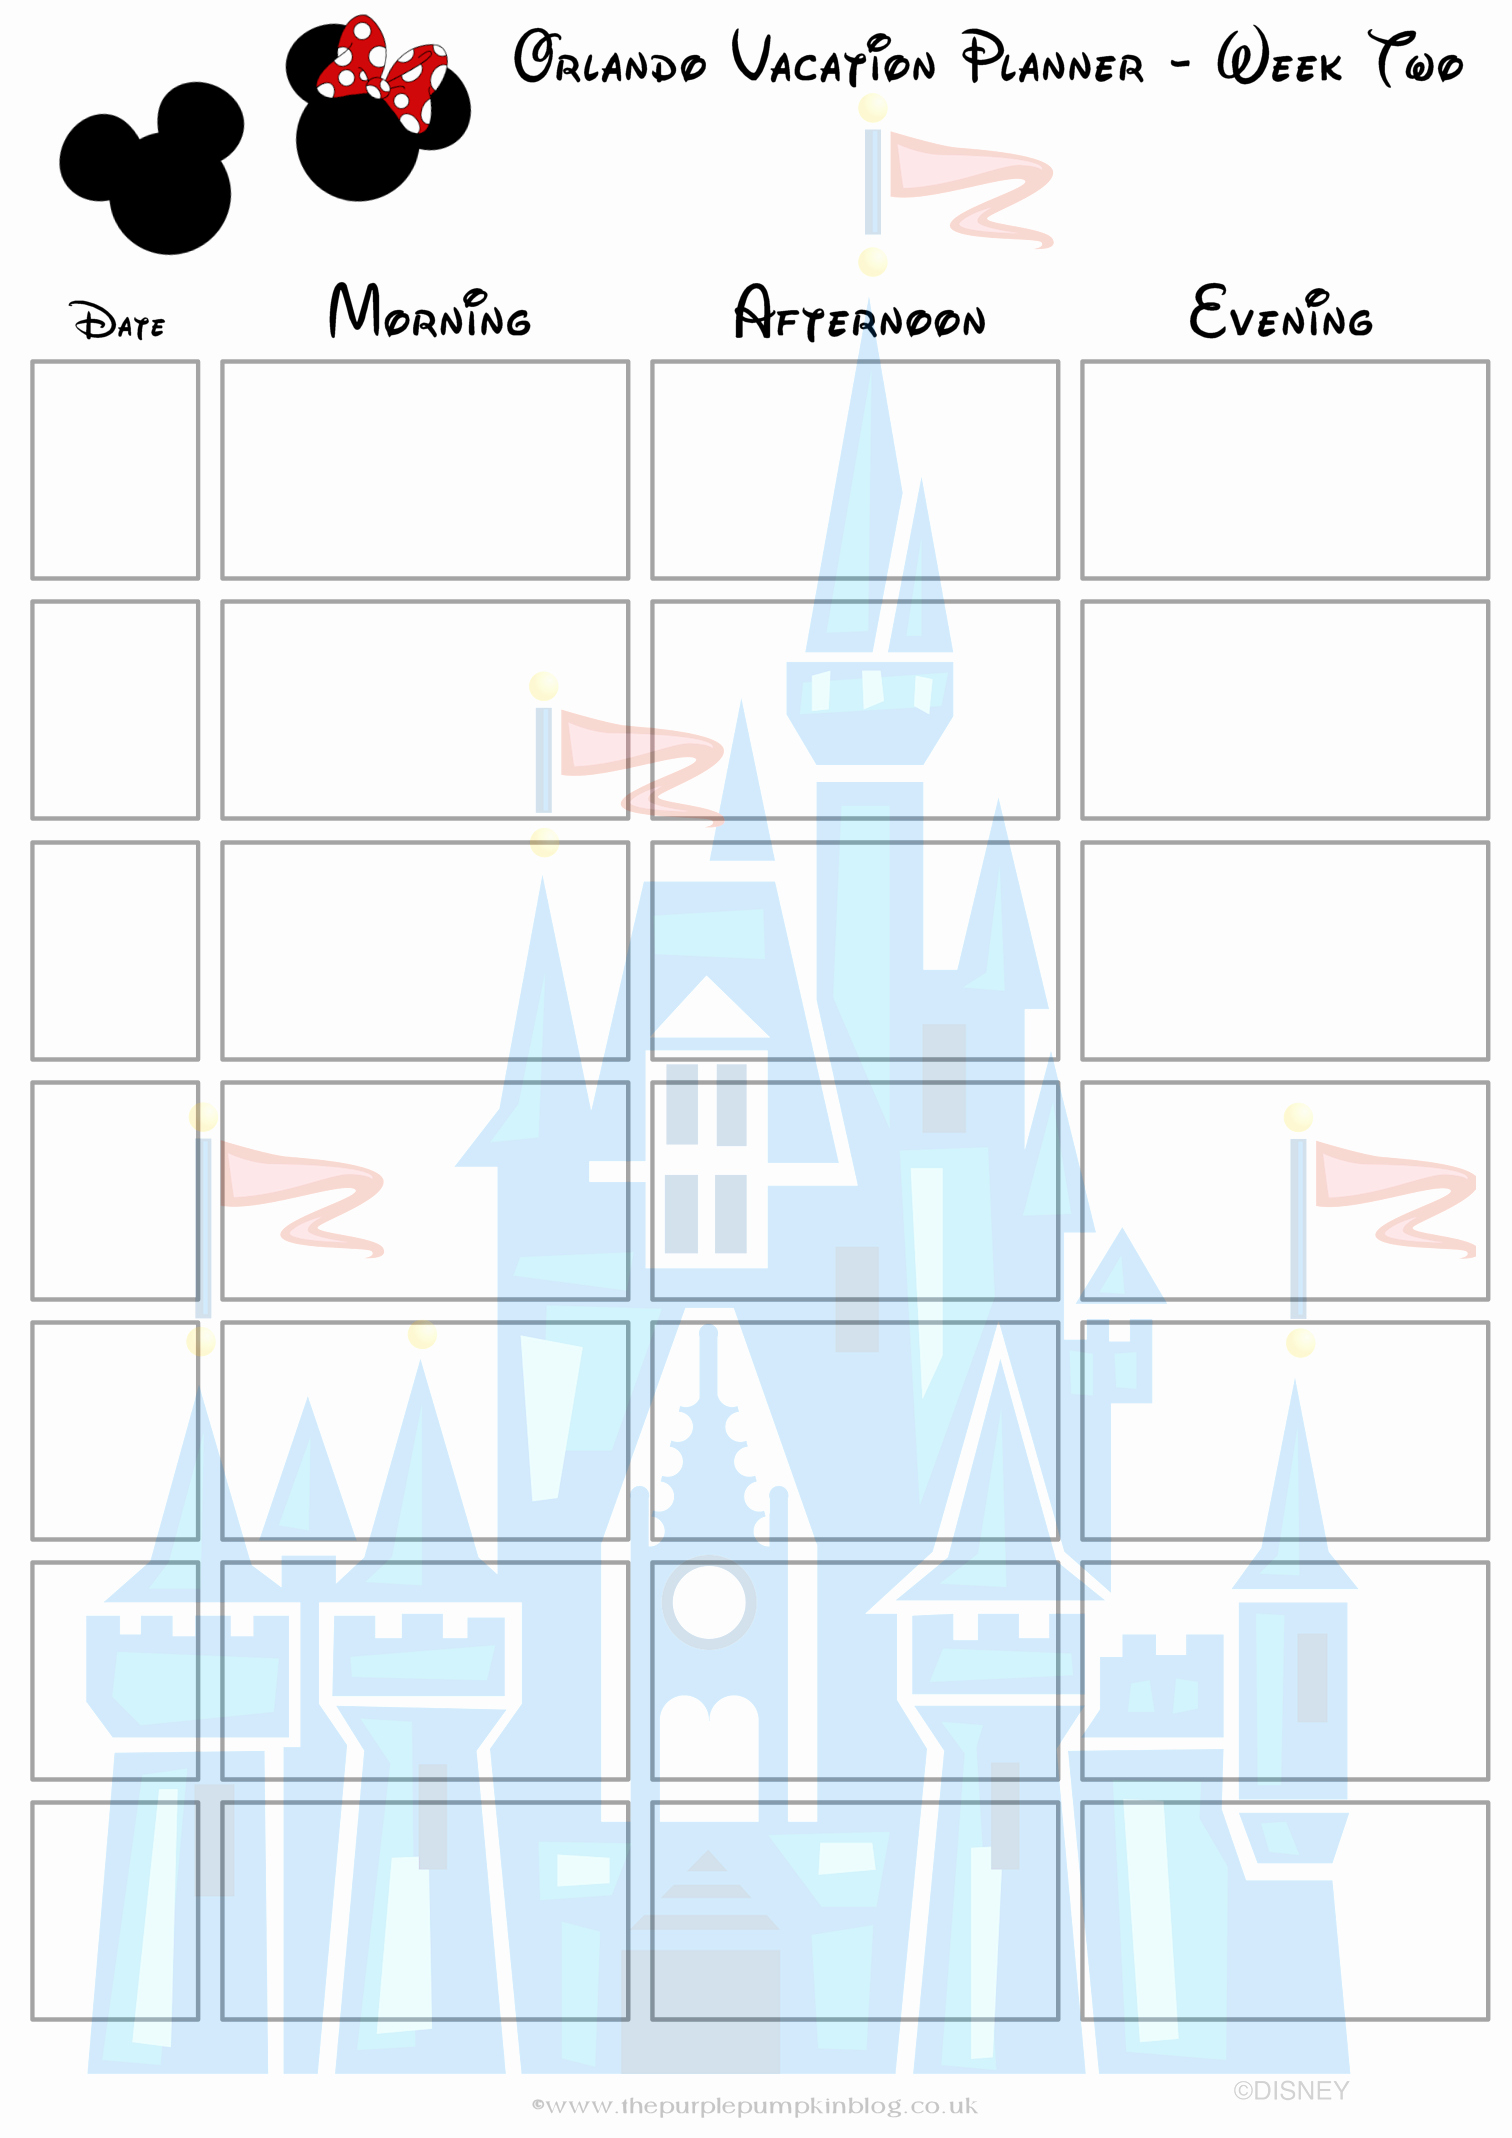 2 Week Calendar Printable Inspirational orlando Walt Disney World Vacation Planner